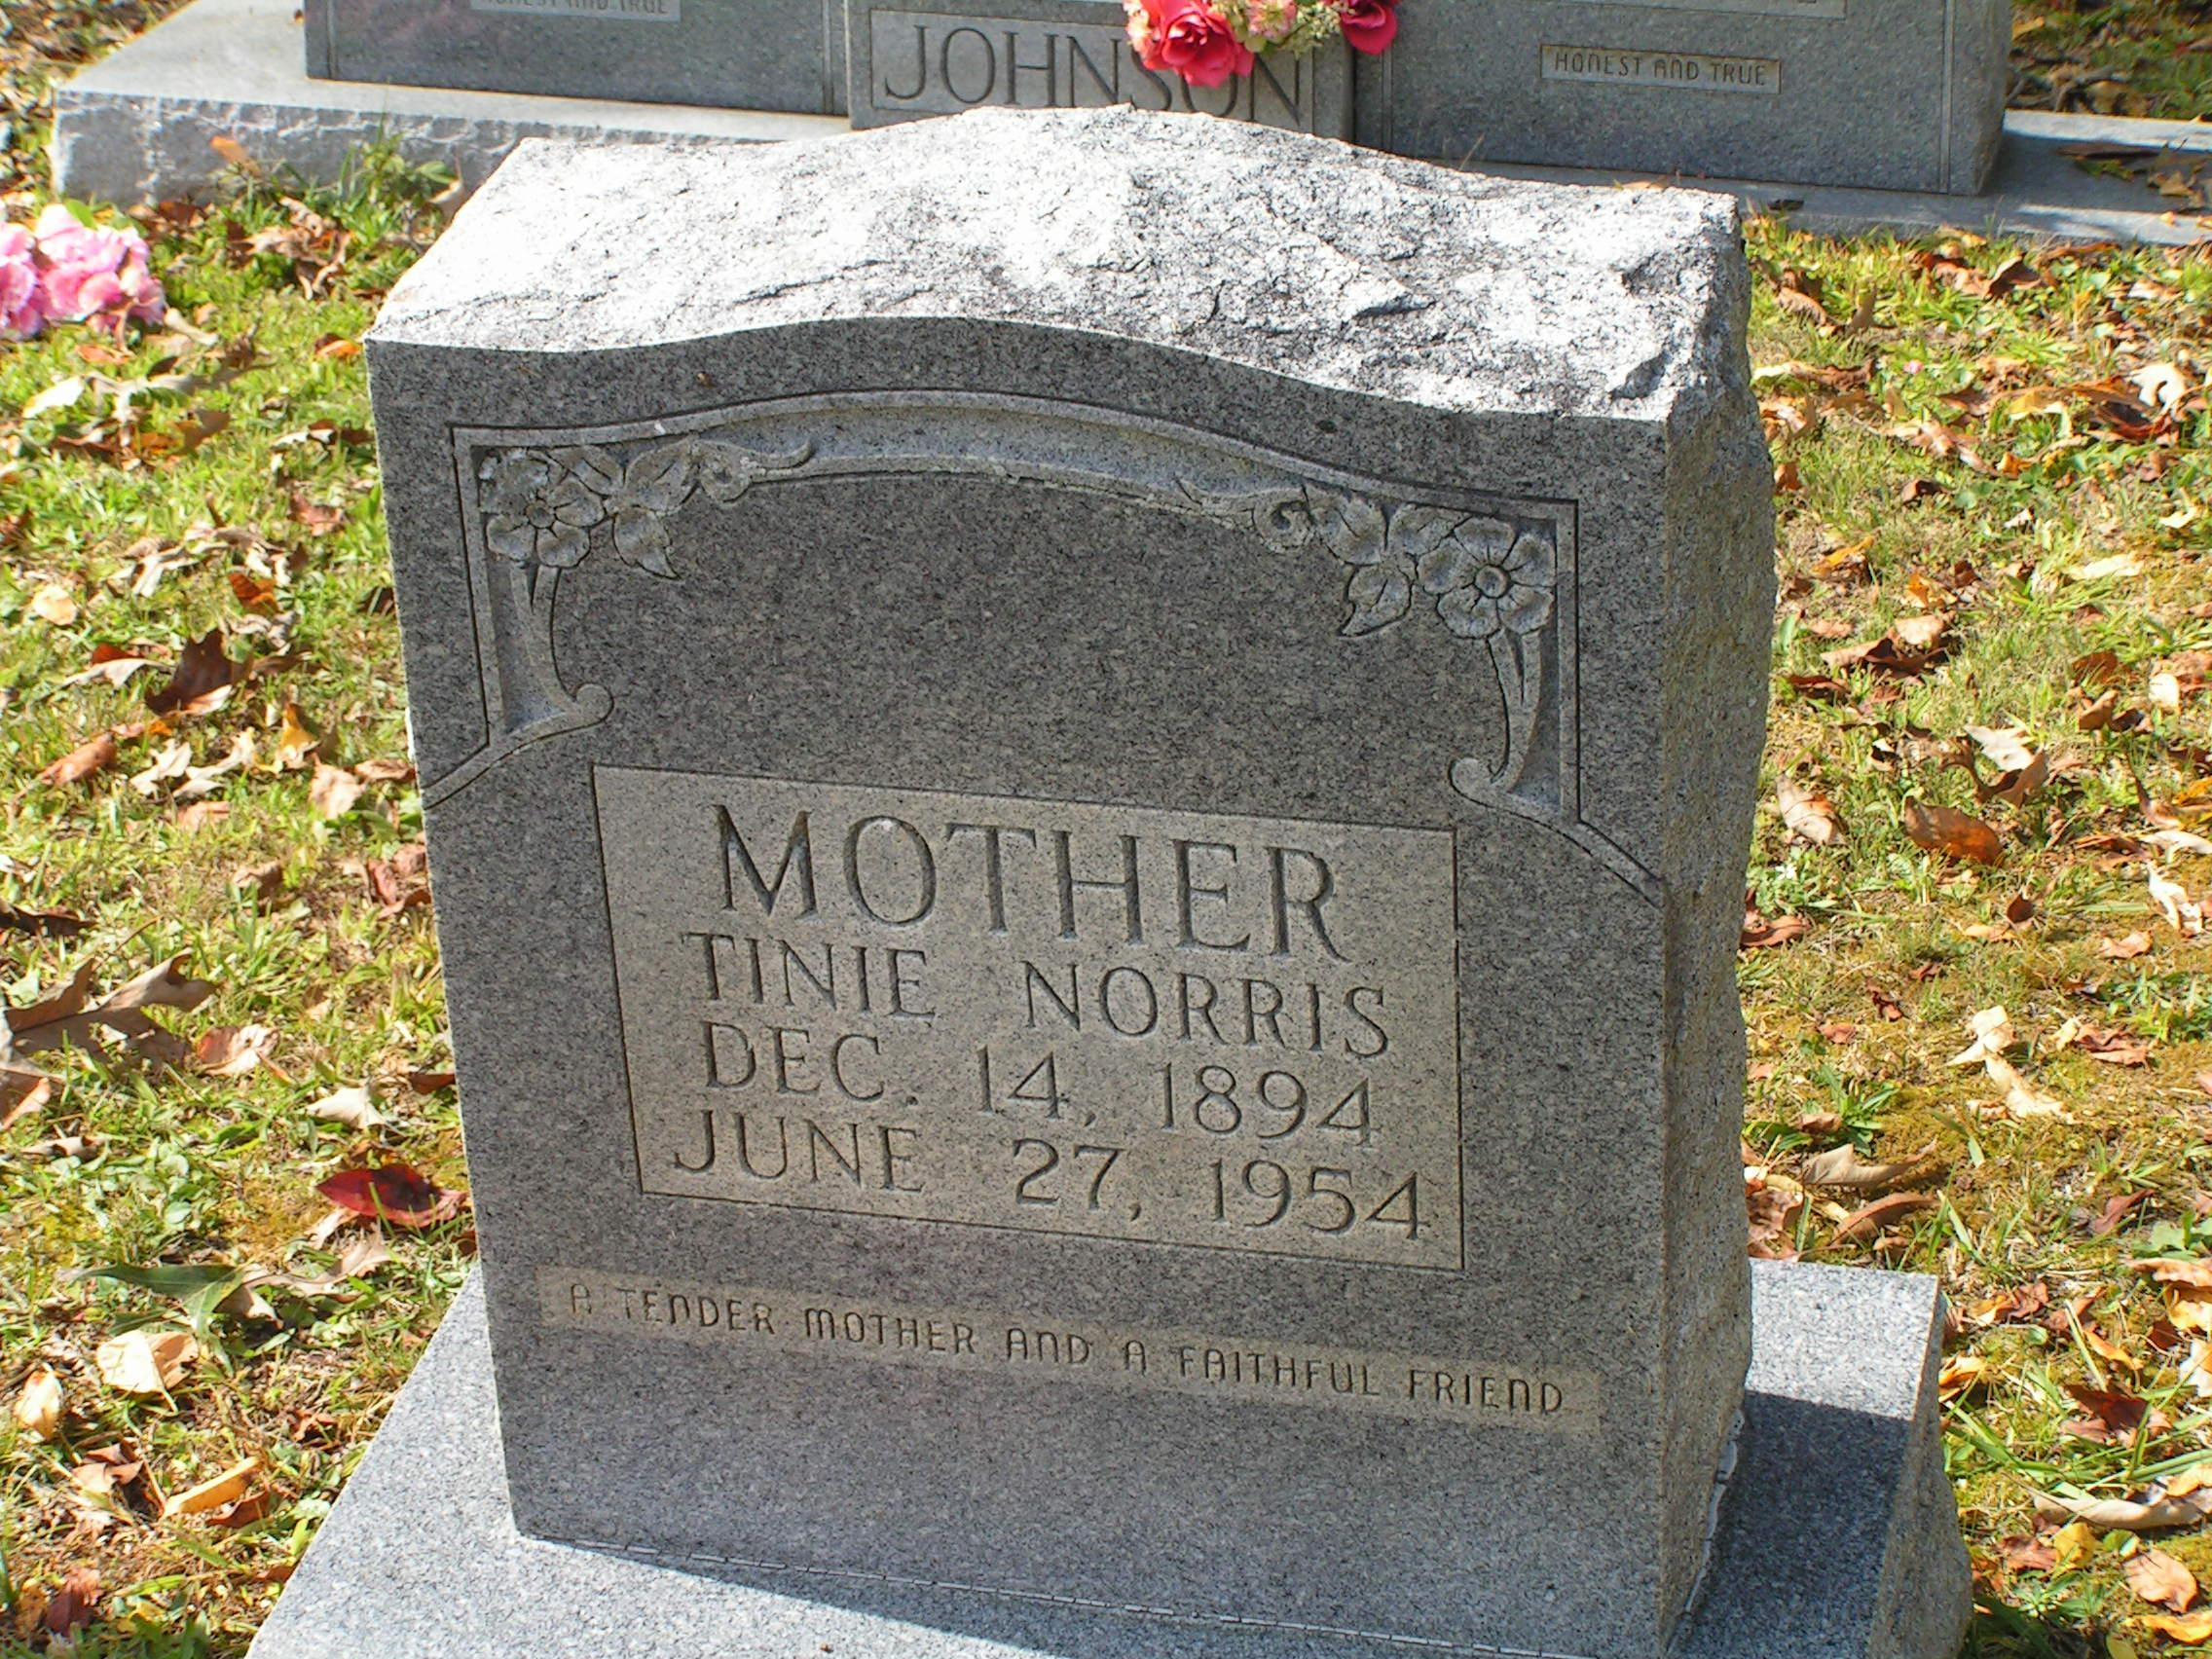 Pastina matilda u201ctinieu201d clayborn norris 1894 1954 find a grave